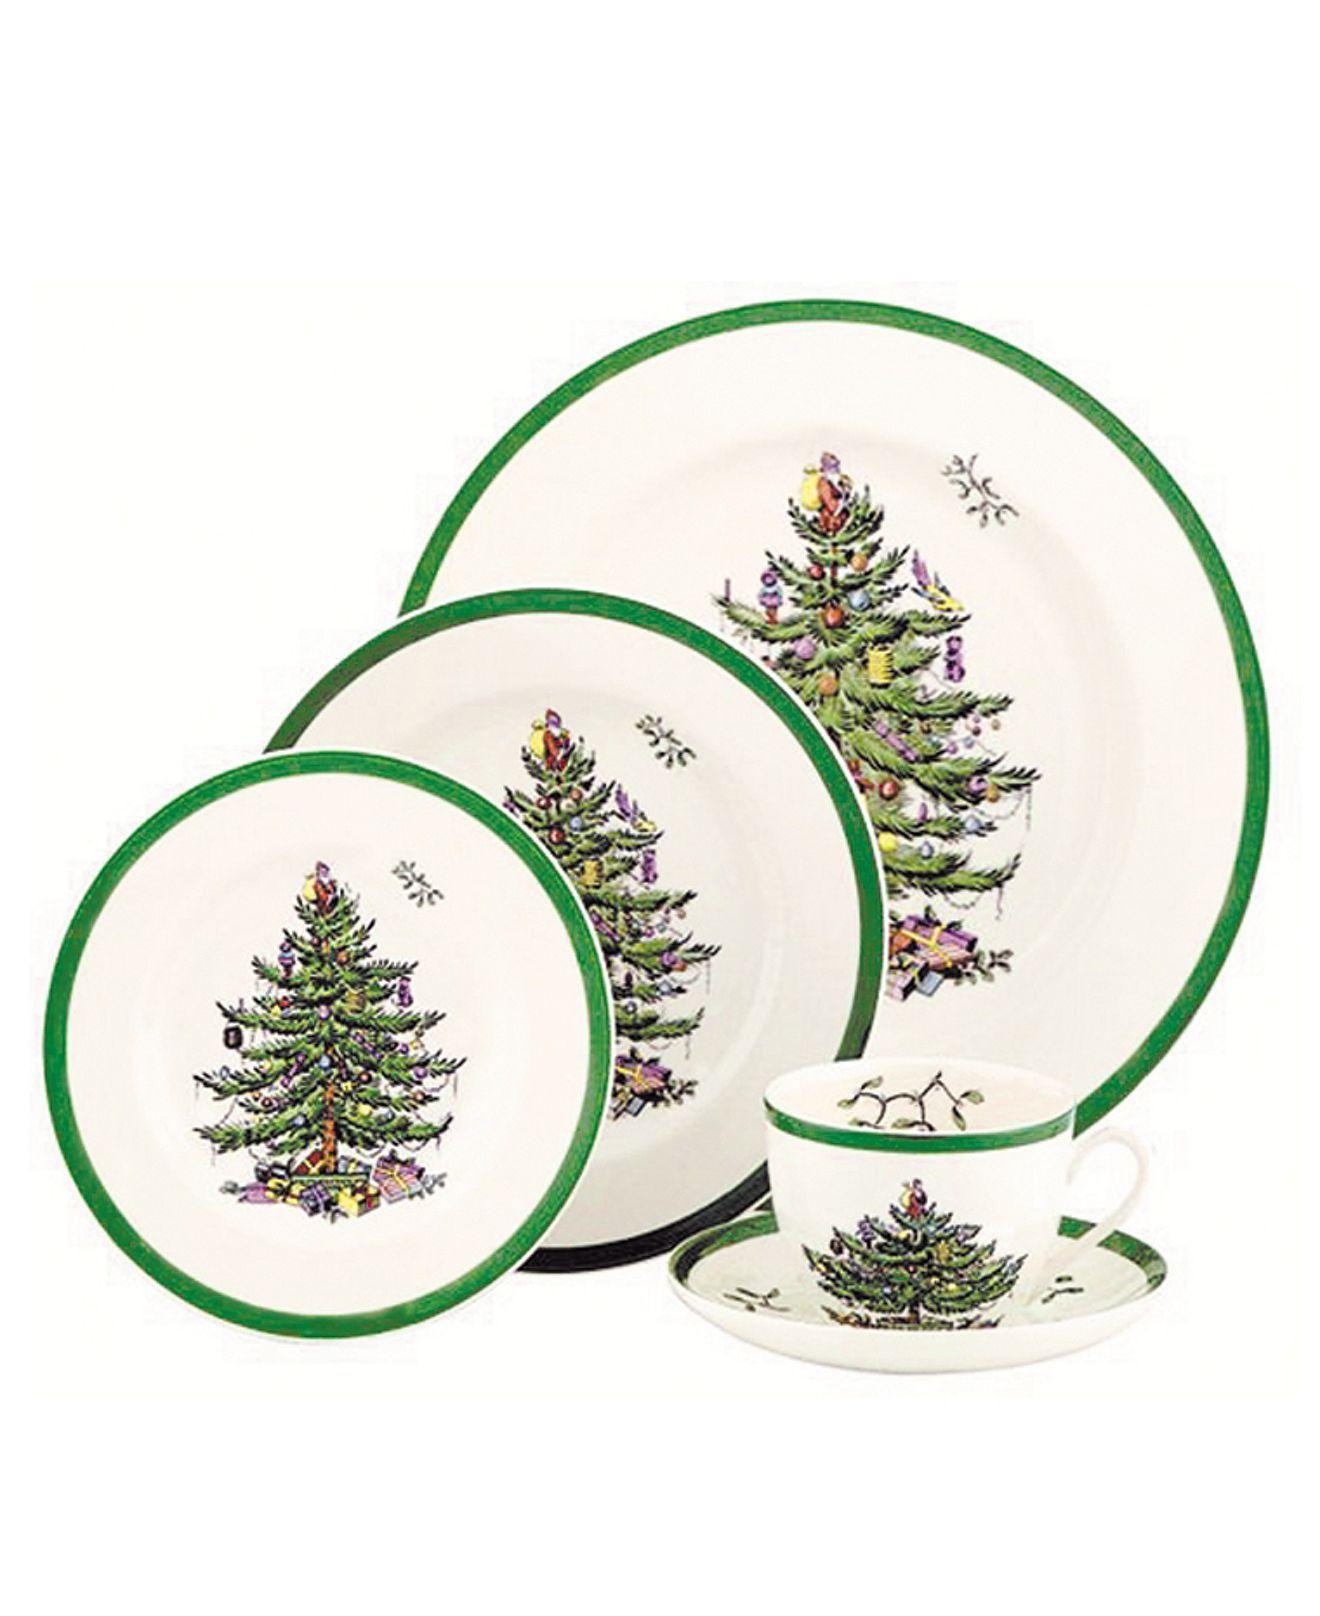 Spode Christmas Tree Sale: Christmas Tree Dinnerware Collection